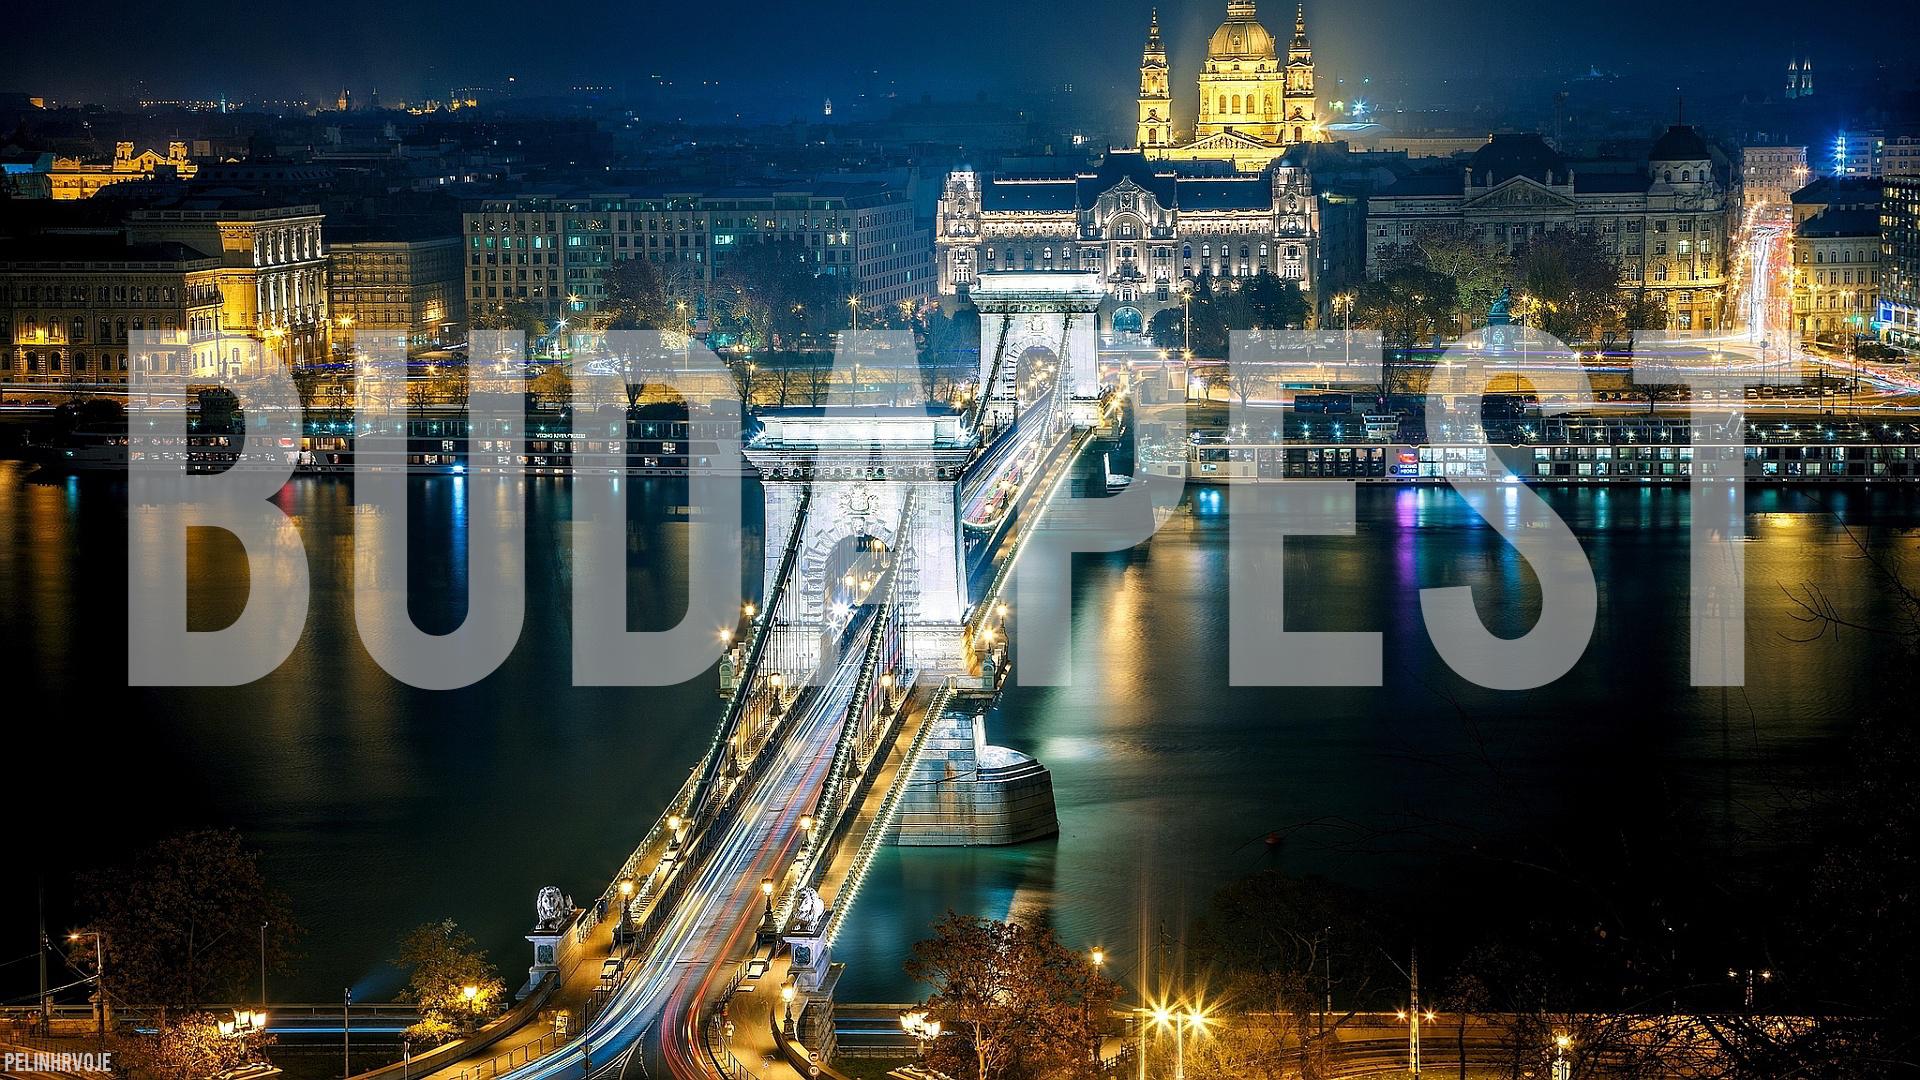 budapest slow tv telekom